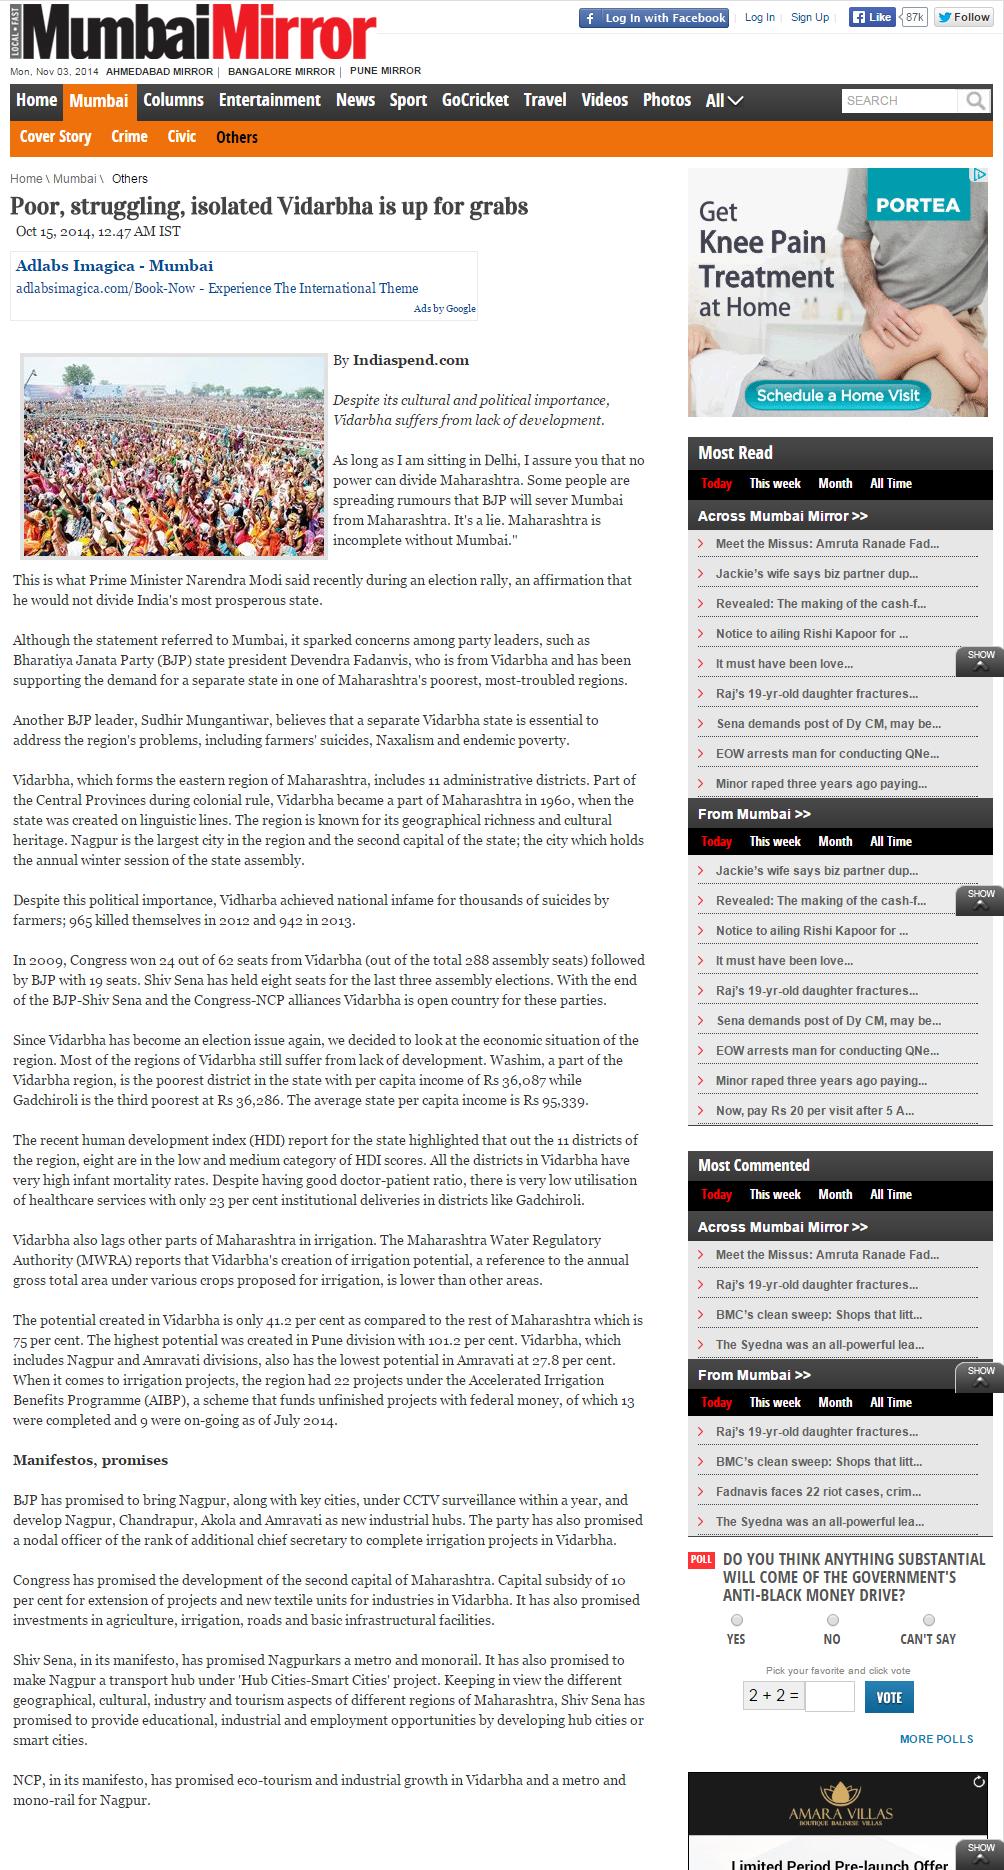 screenshot-www.mumbaimirror.com 2014-11-03 16-00-01